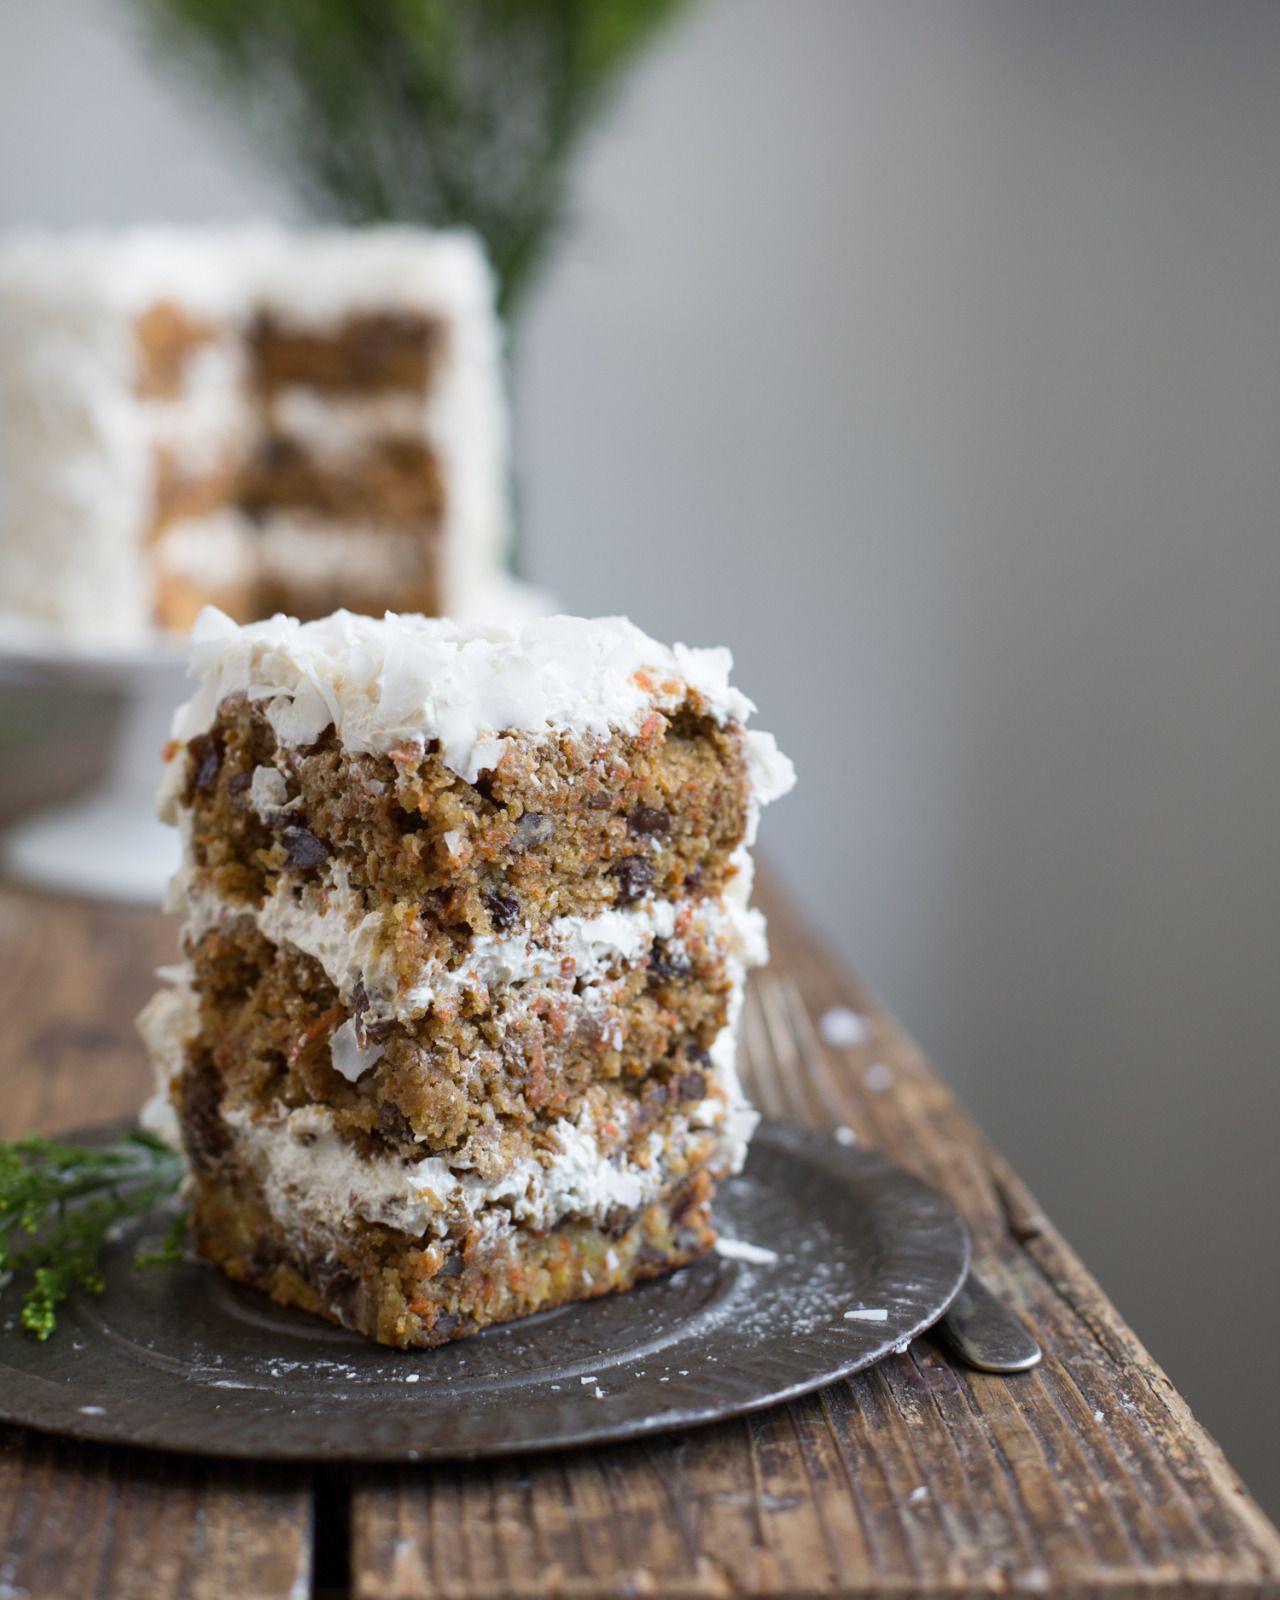 My Paleo Patisserie Carrot Cake